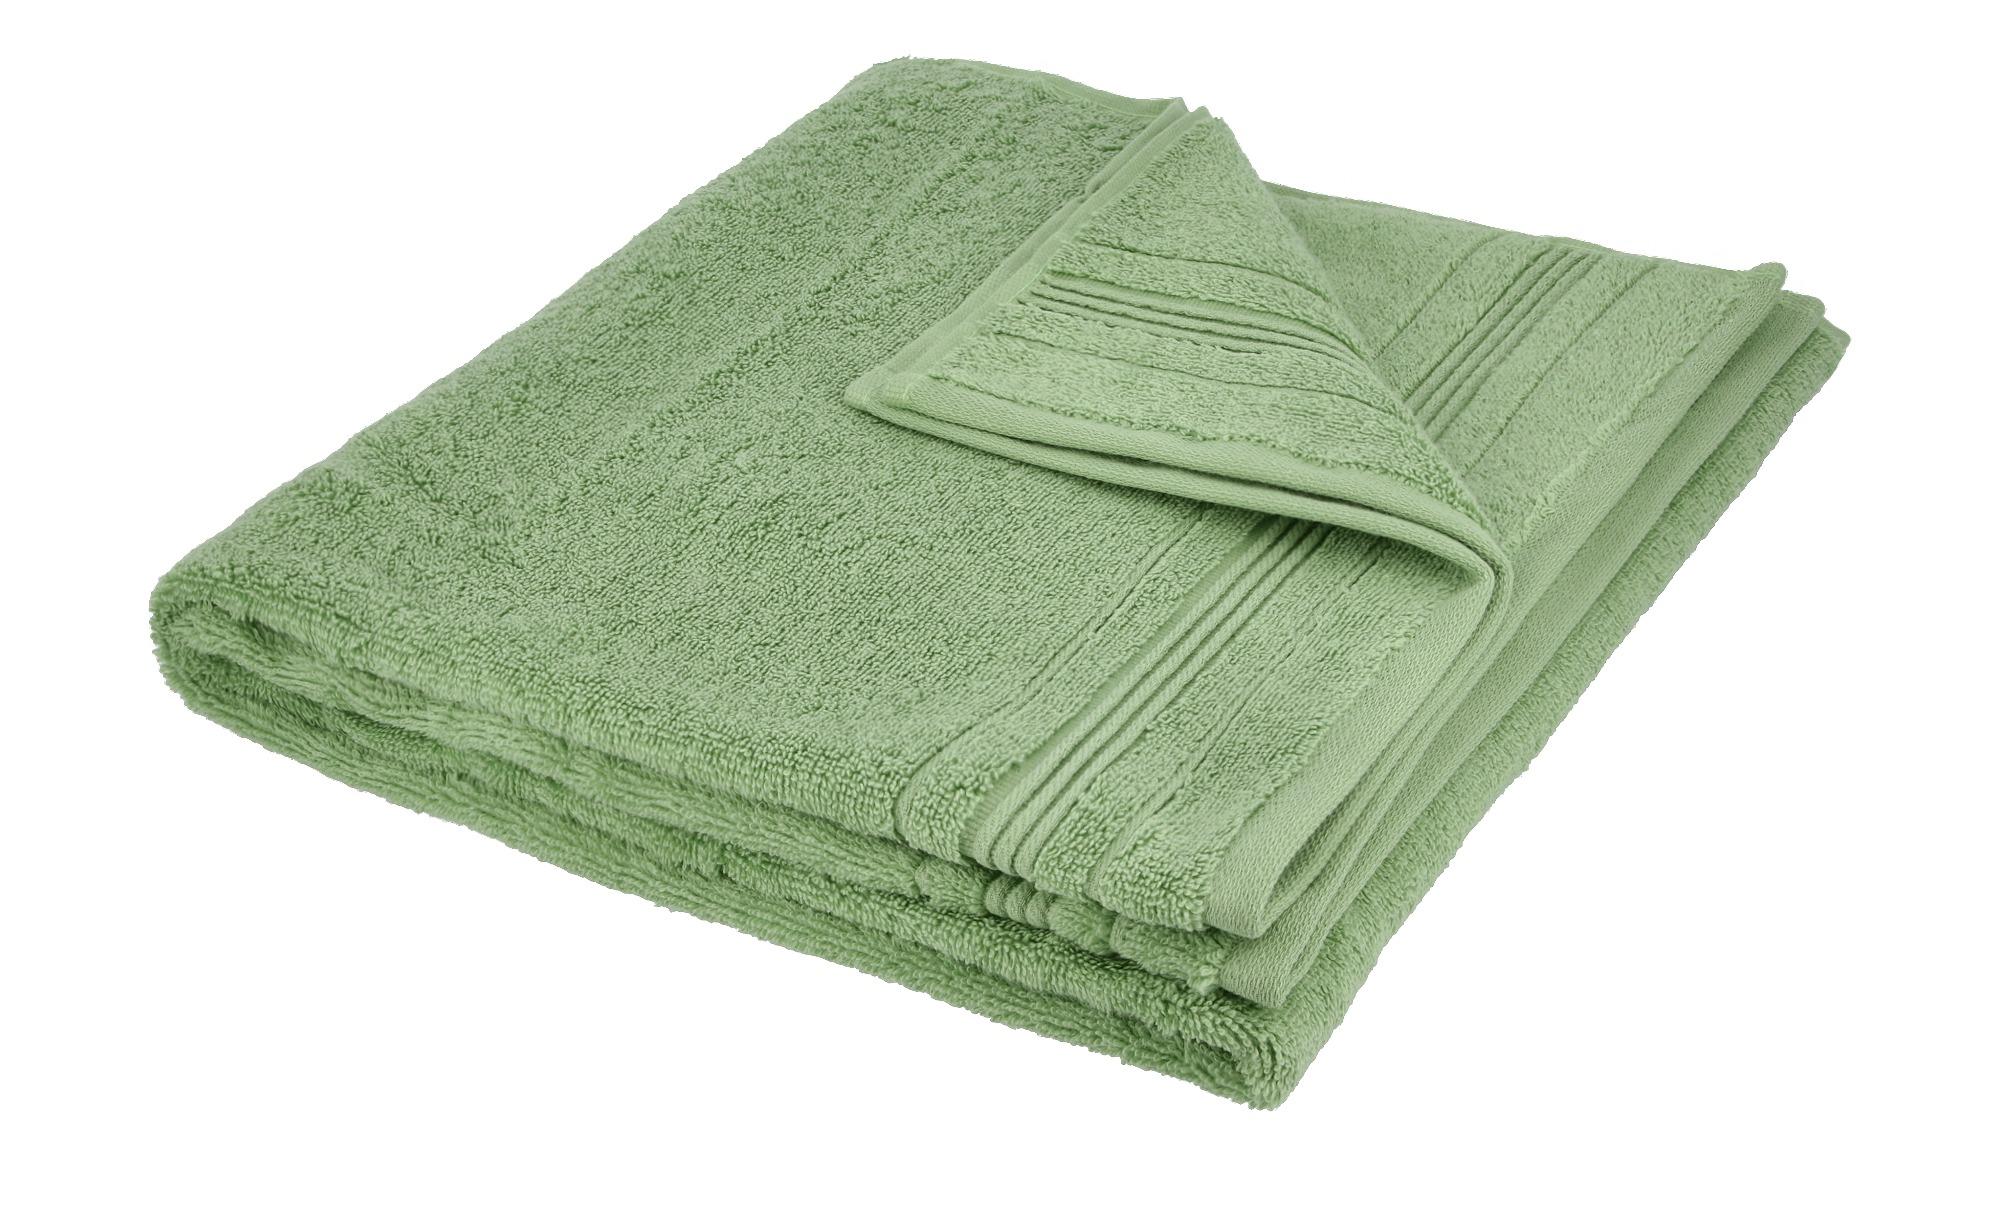 VOSSEN Duschtuch  Soft Dreams ¦ grün ¦ 100% Baumwolle ¦ Maße (cm): B: 67 Badtextilien und Zubehör > Handtücher & Badetücher > Duschtücher - Höffner